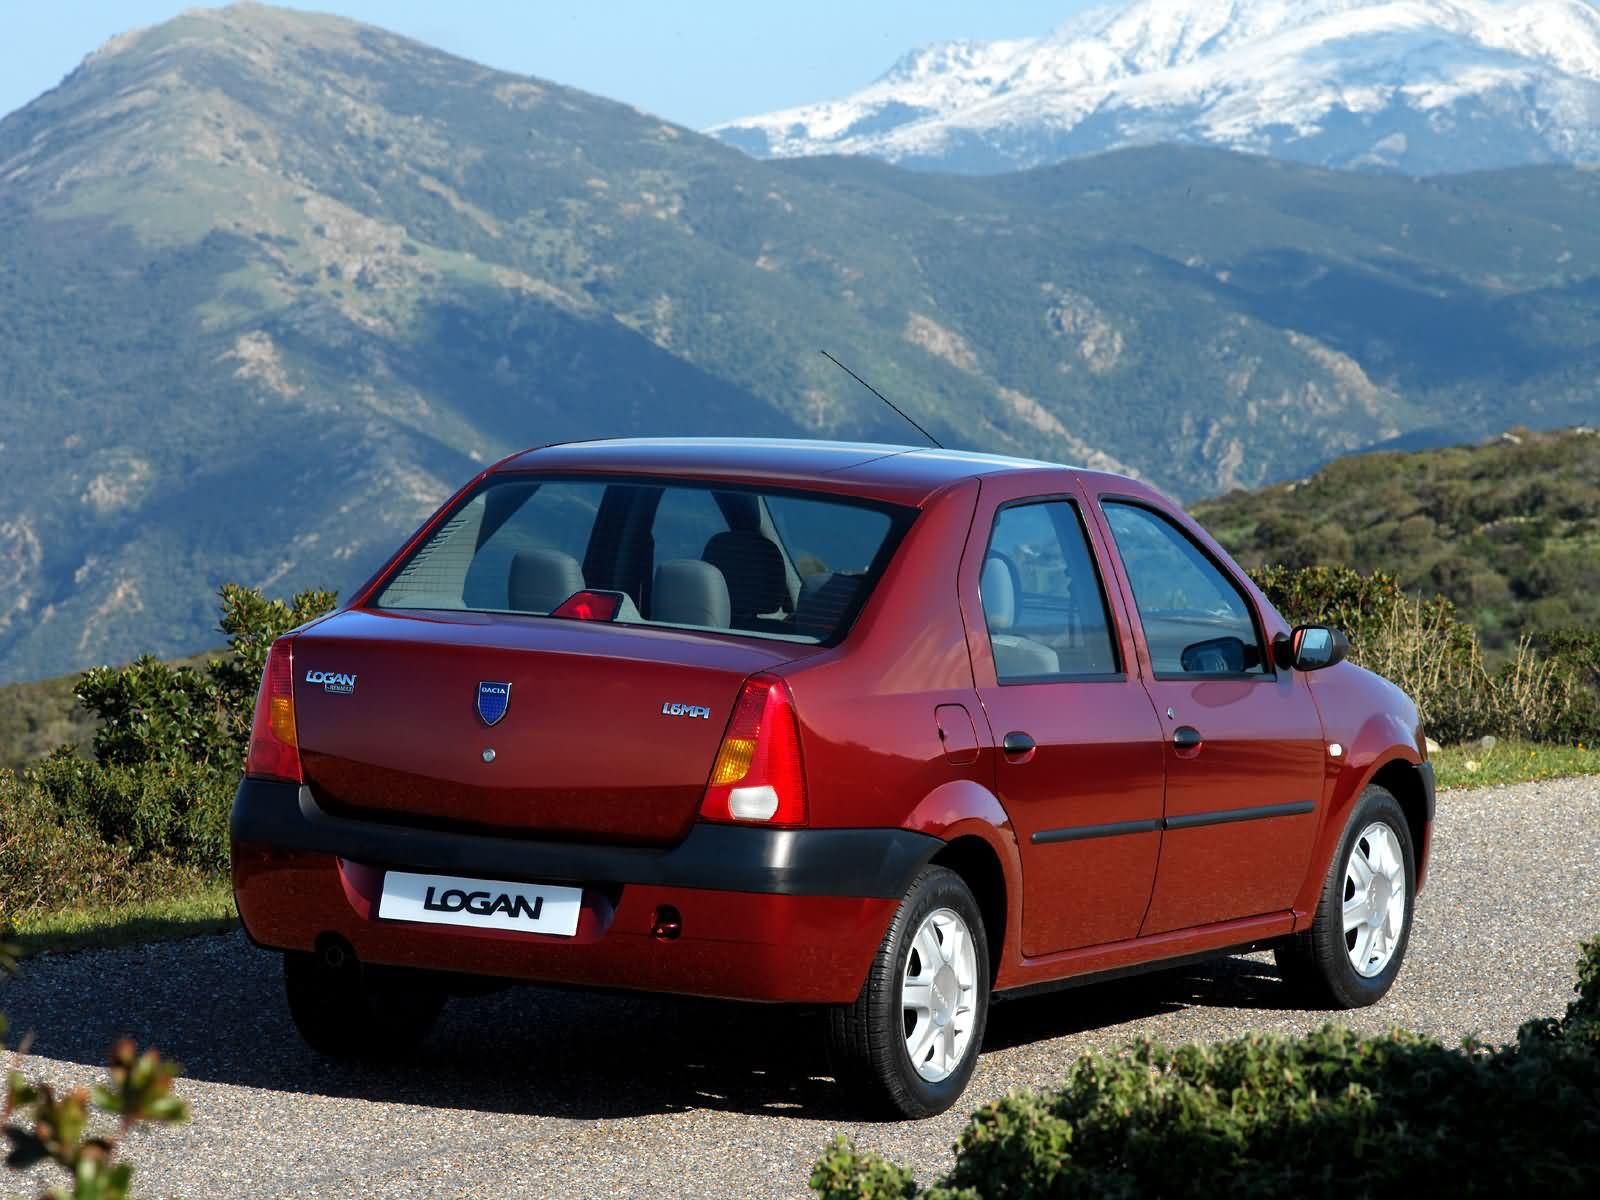 Dacia Logan 2004 carinpicture com Dacia-Logan-2004-Photo-46